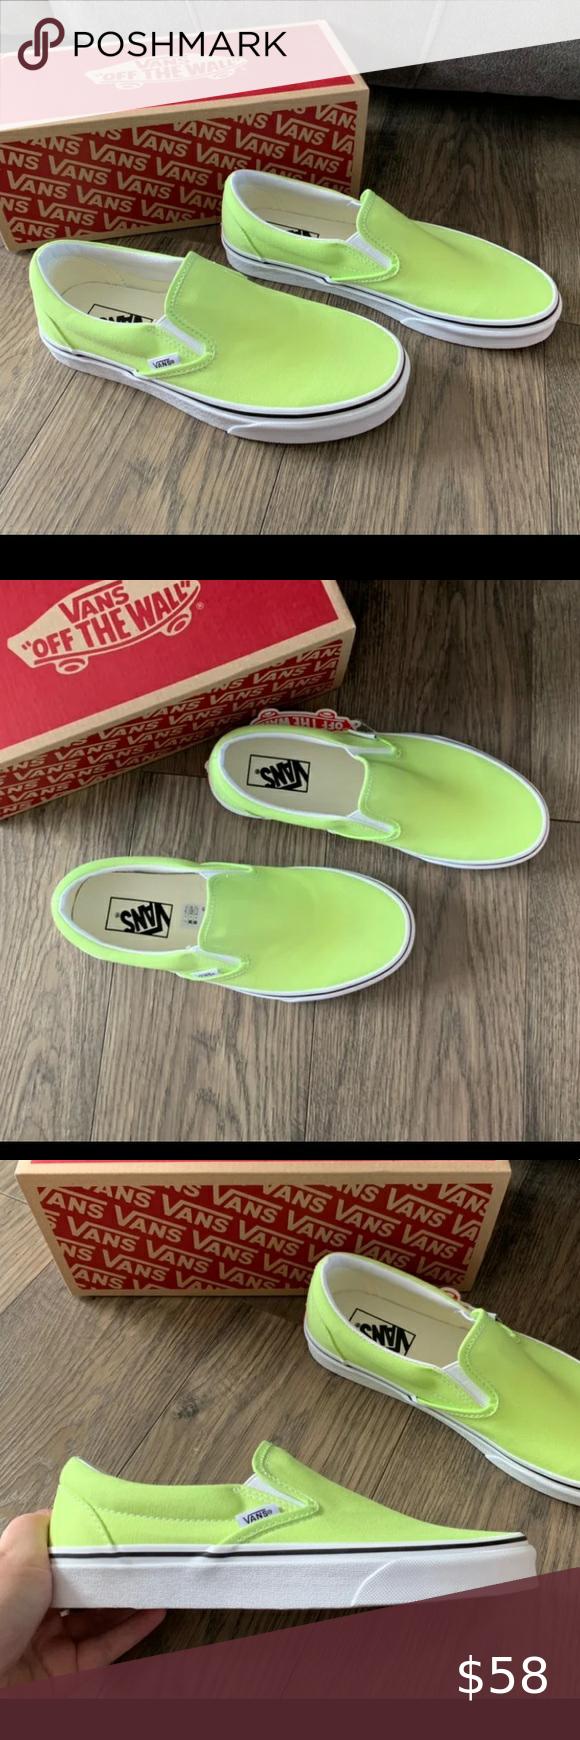 Vans classic slip on sharp green shoes